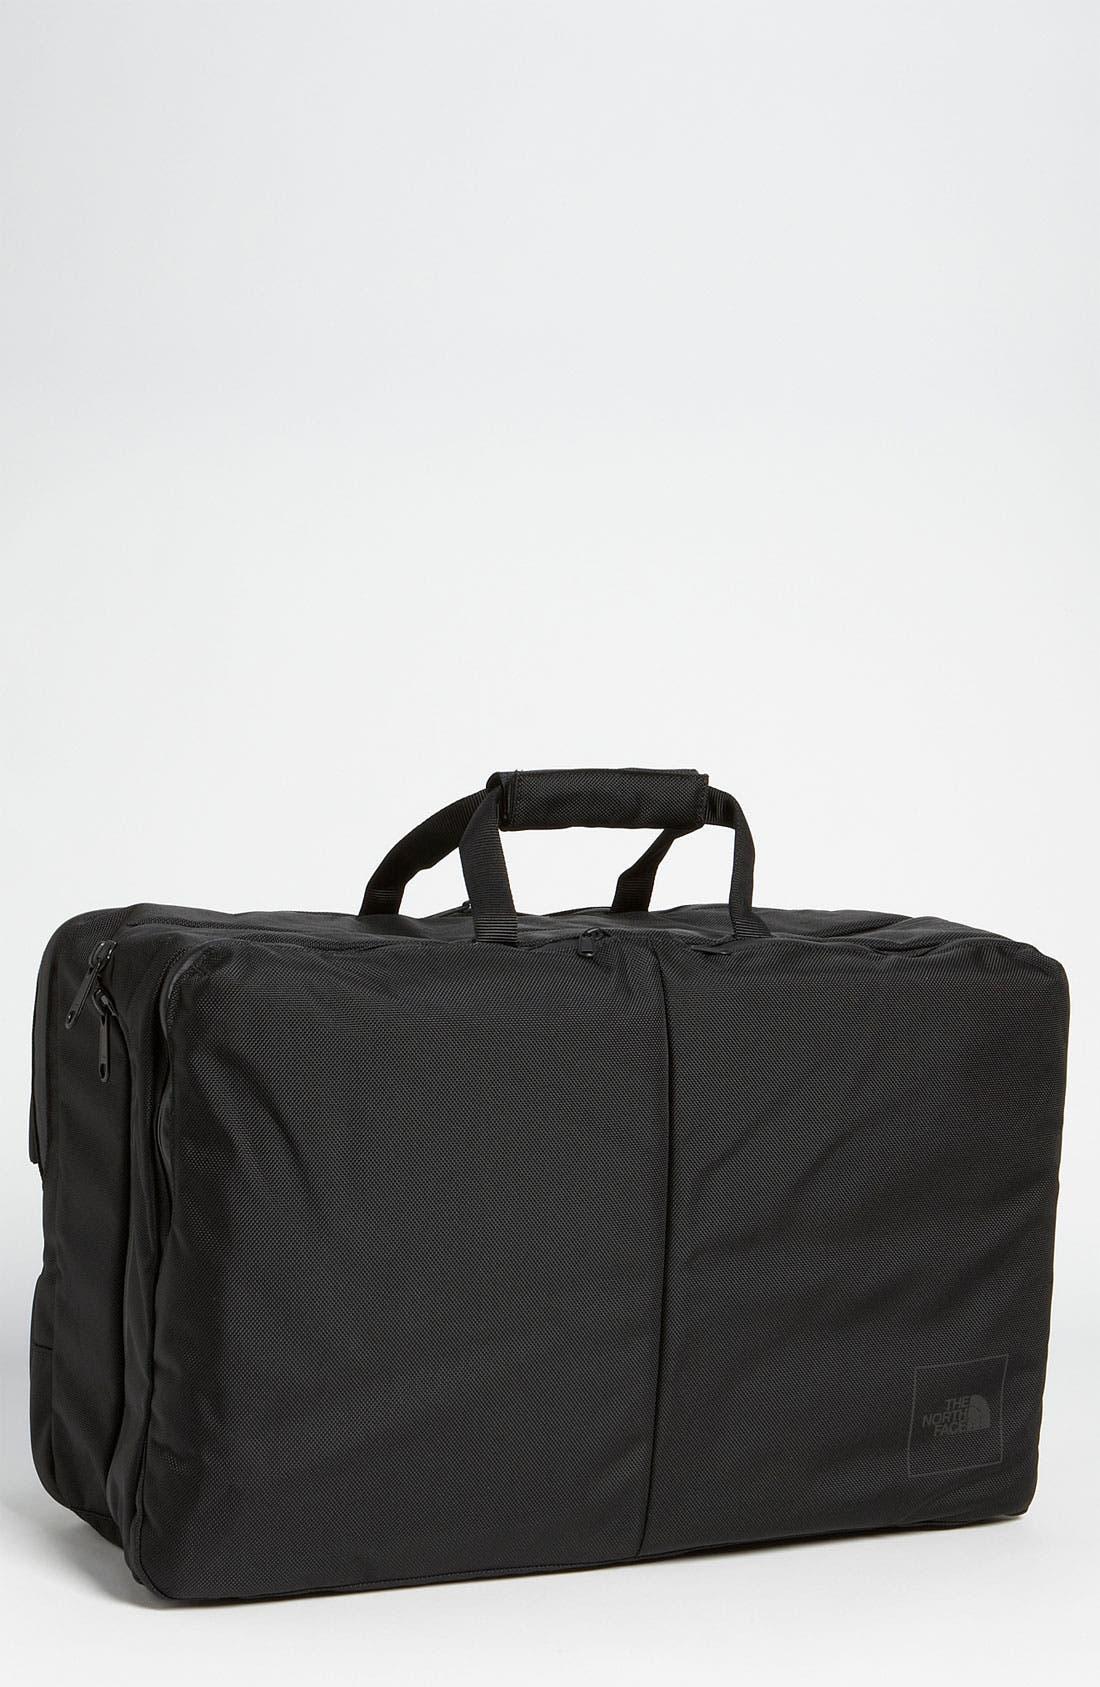 Main Image - The North Face 'Shuttle' Duffel Bag